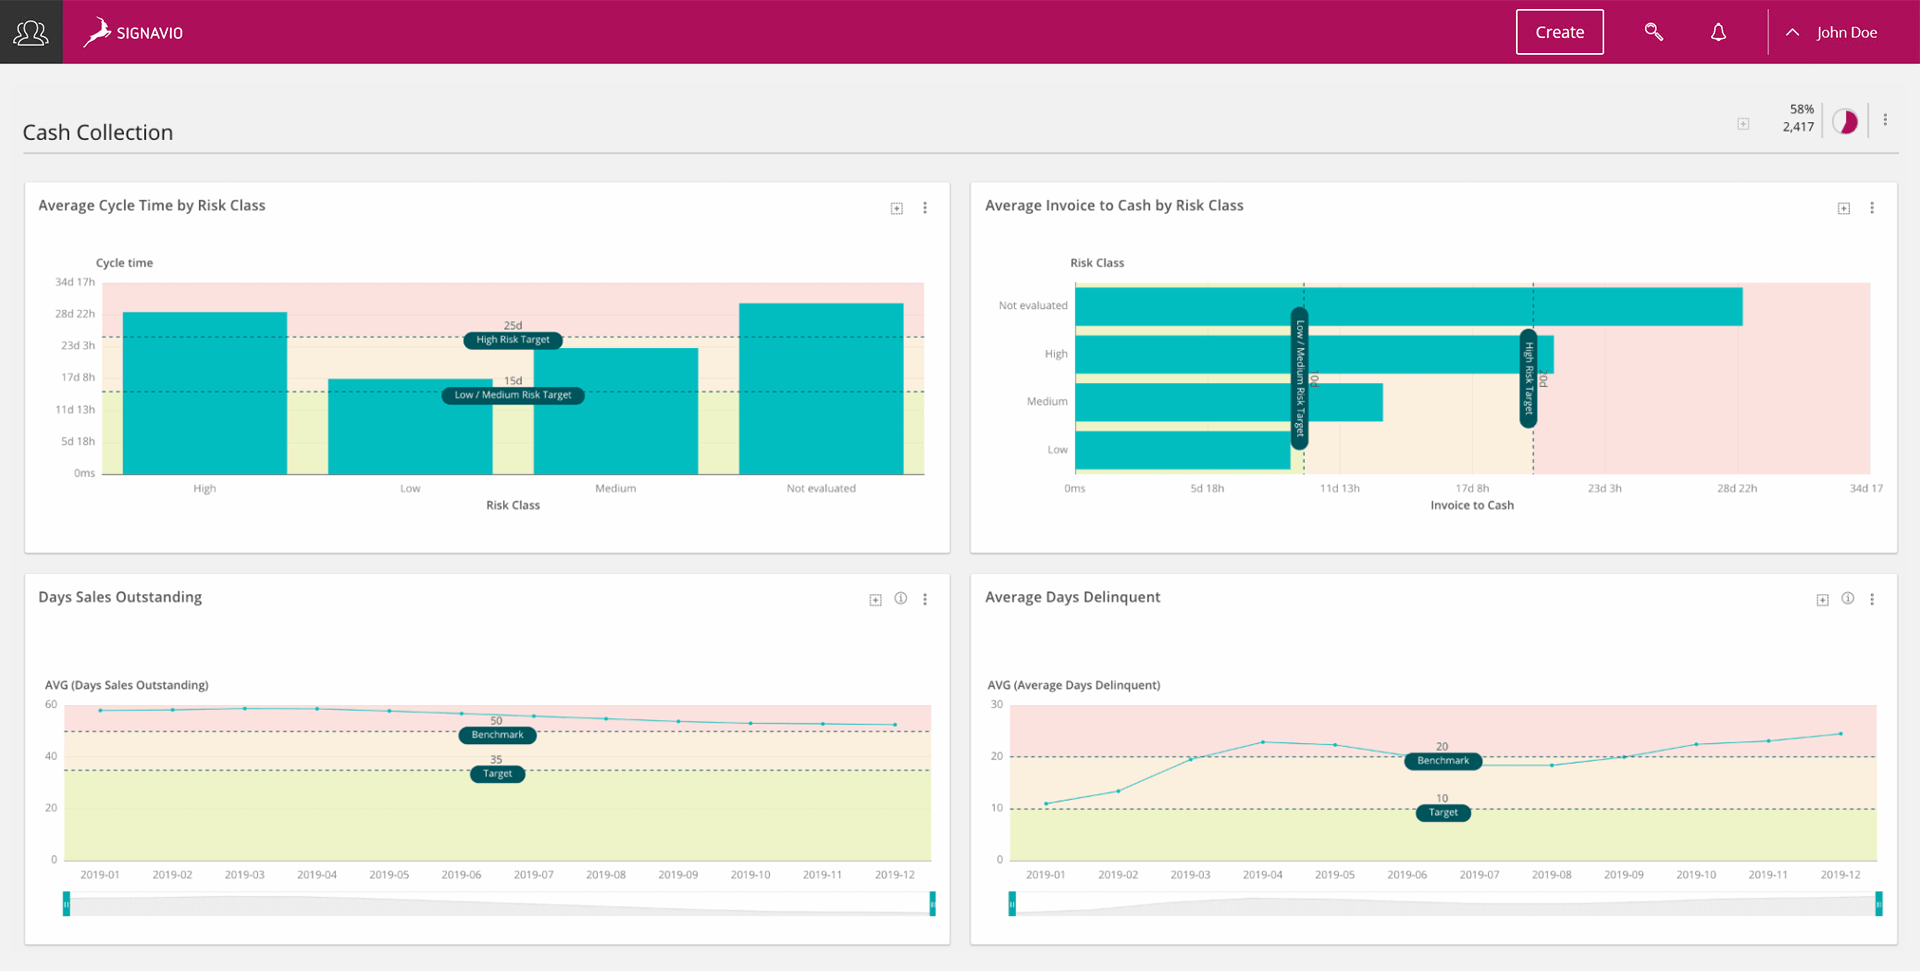 Signavio Order-to-Cash Process - analyze your process screen